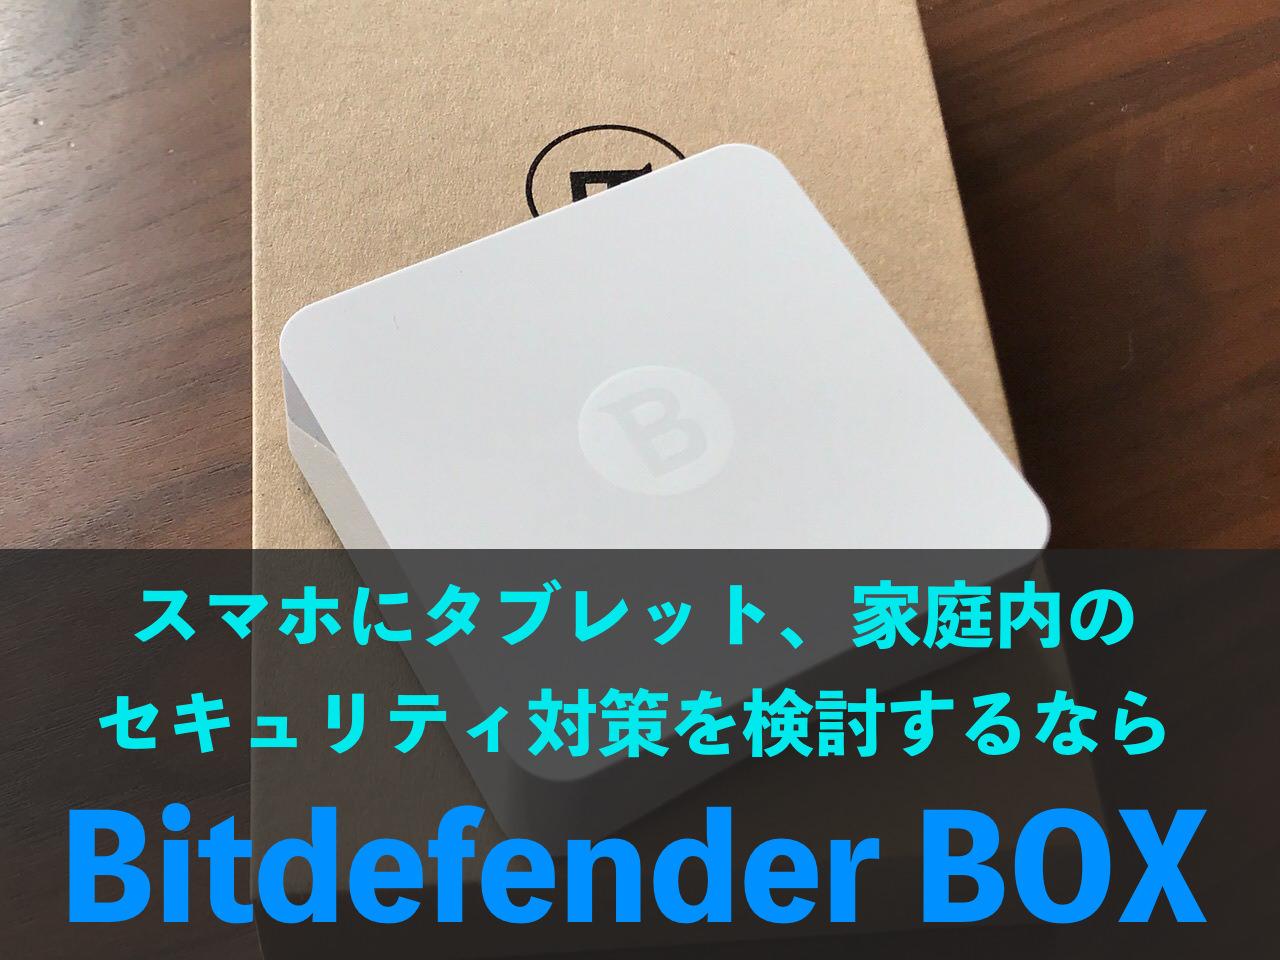 Bitdefender box 30827t 1